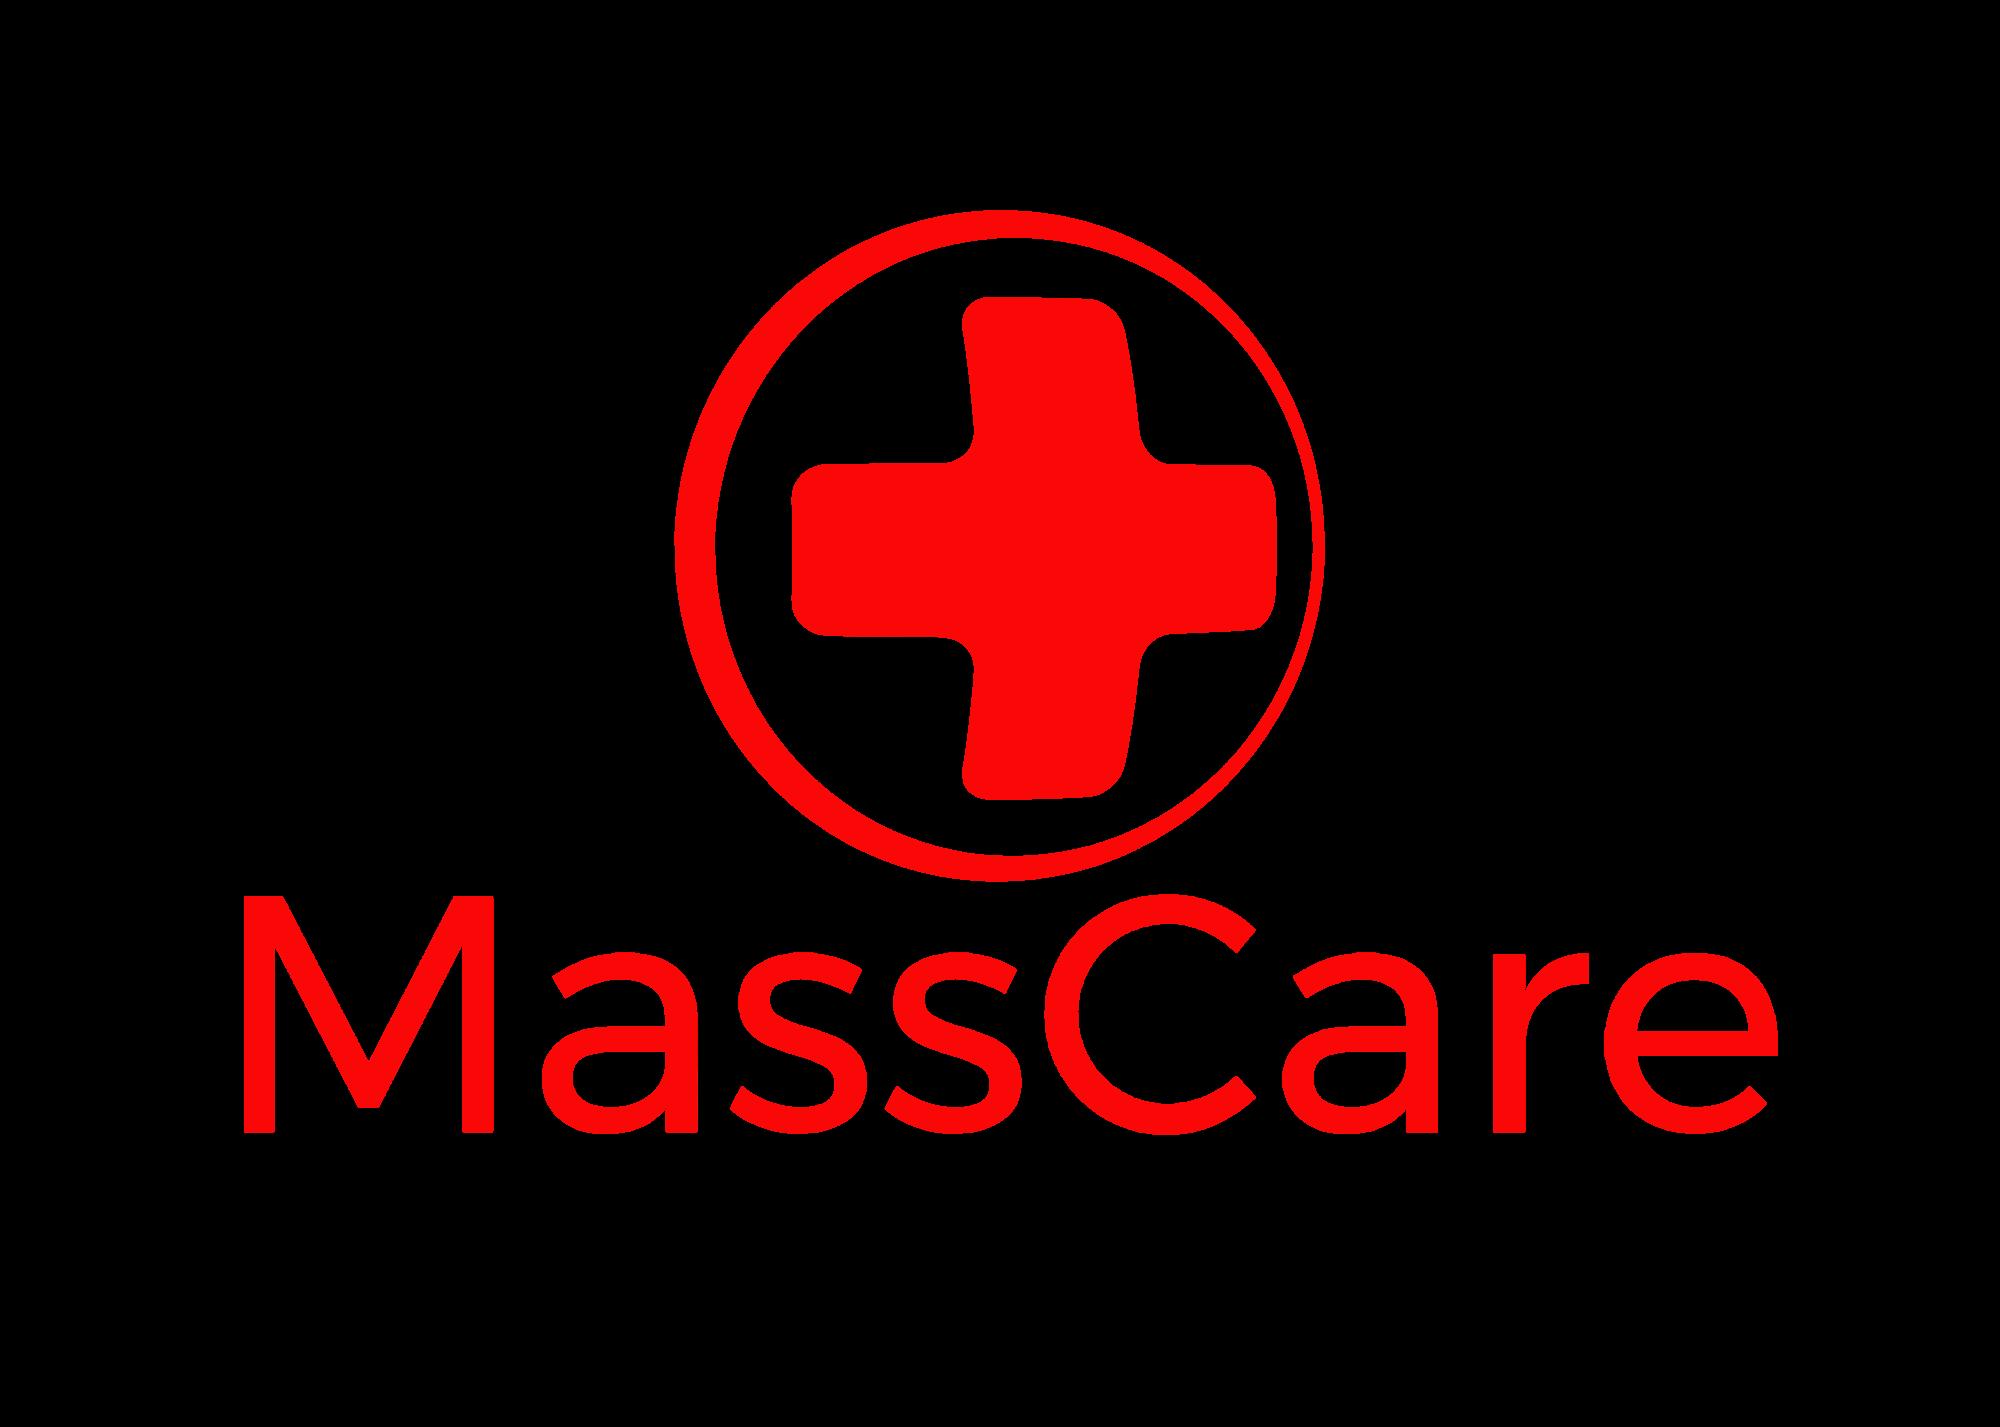 MassCare-logo.png